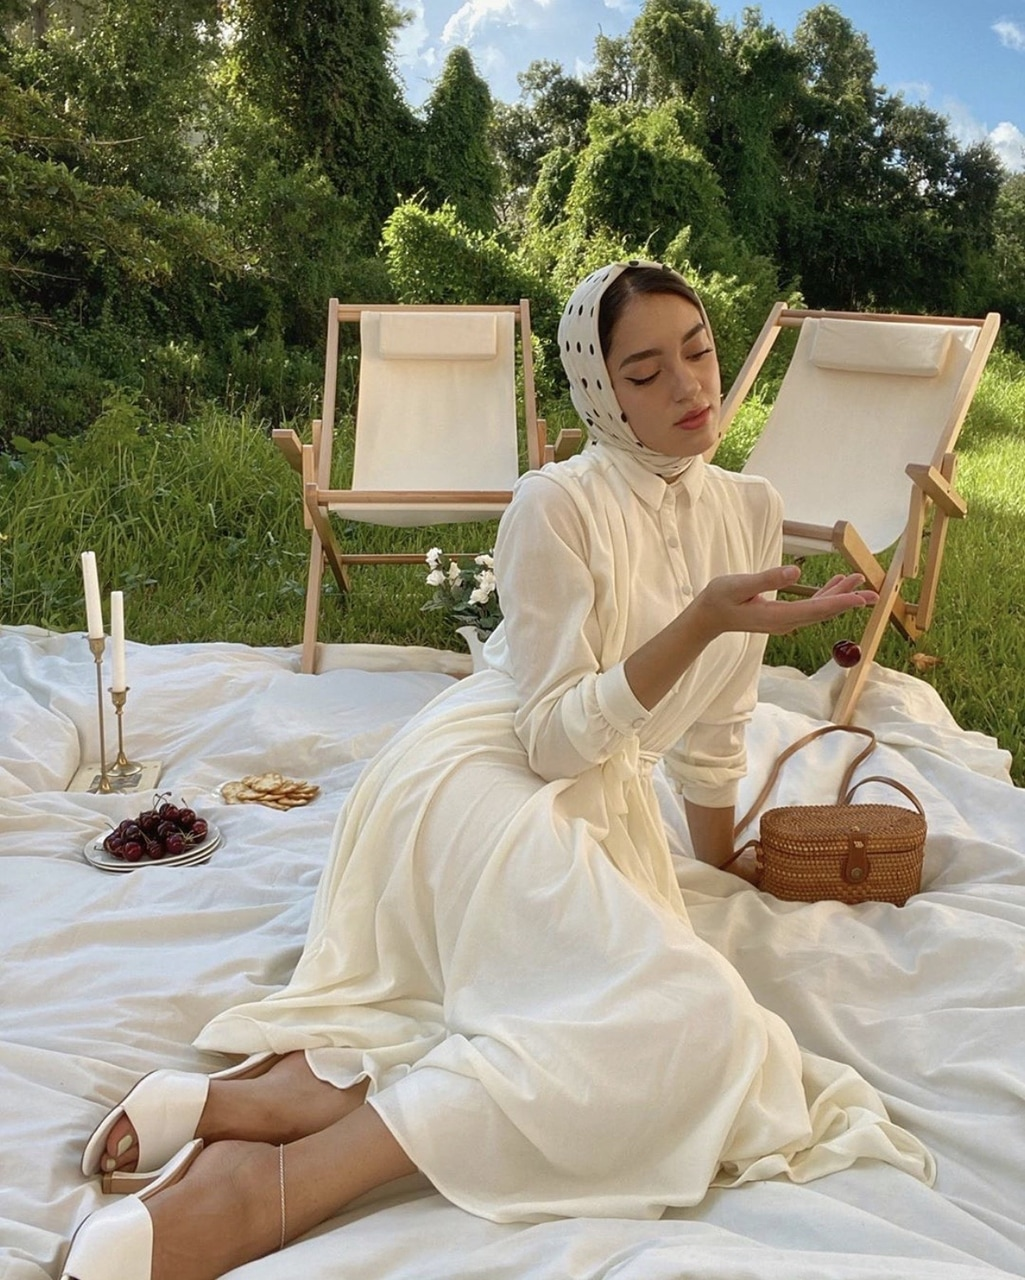 aesthetic, fashion, and picnic image